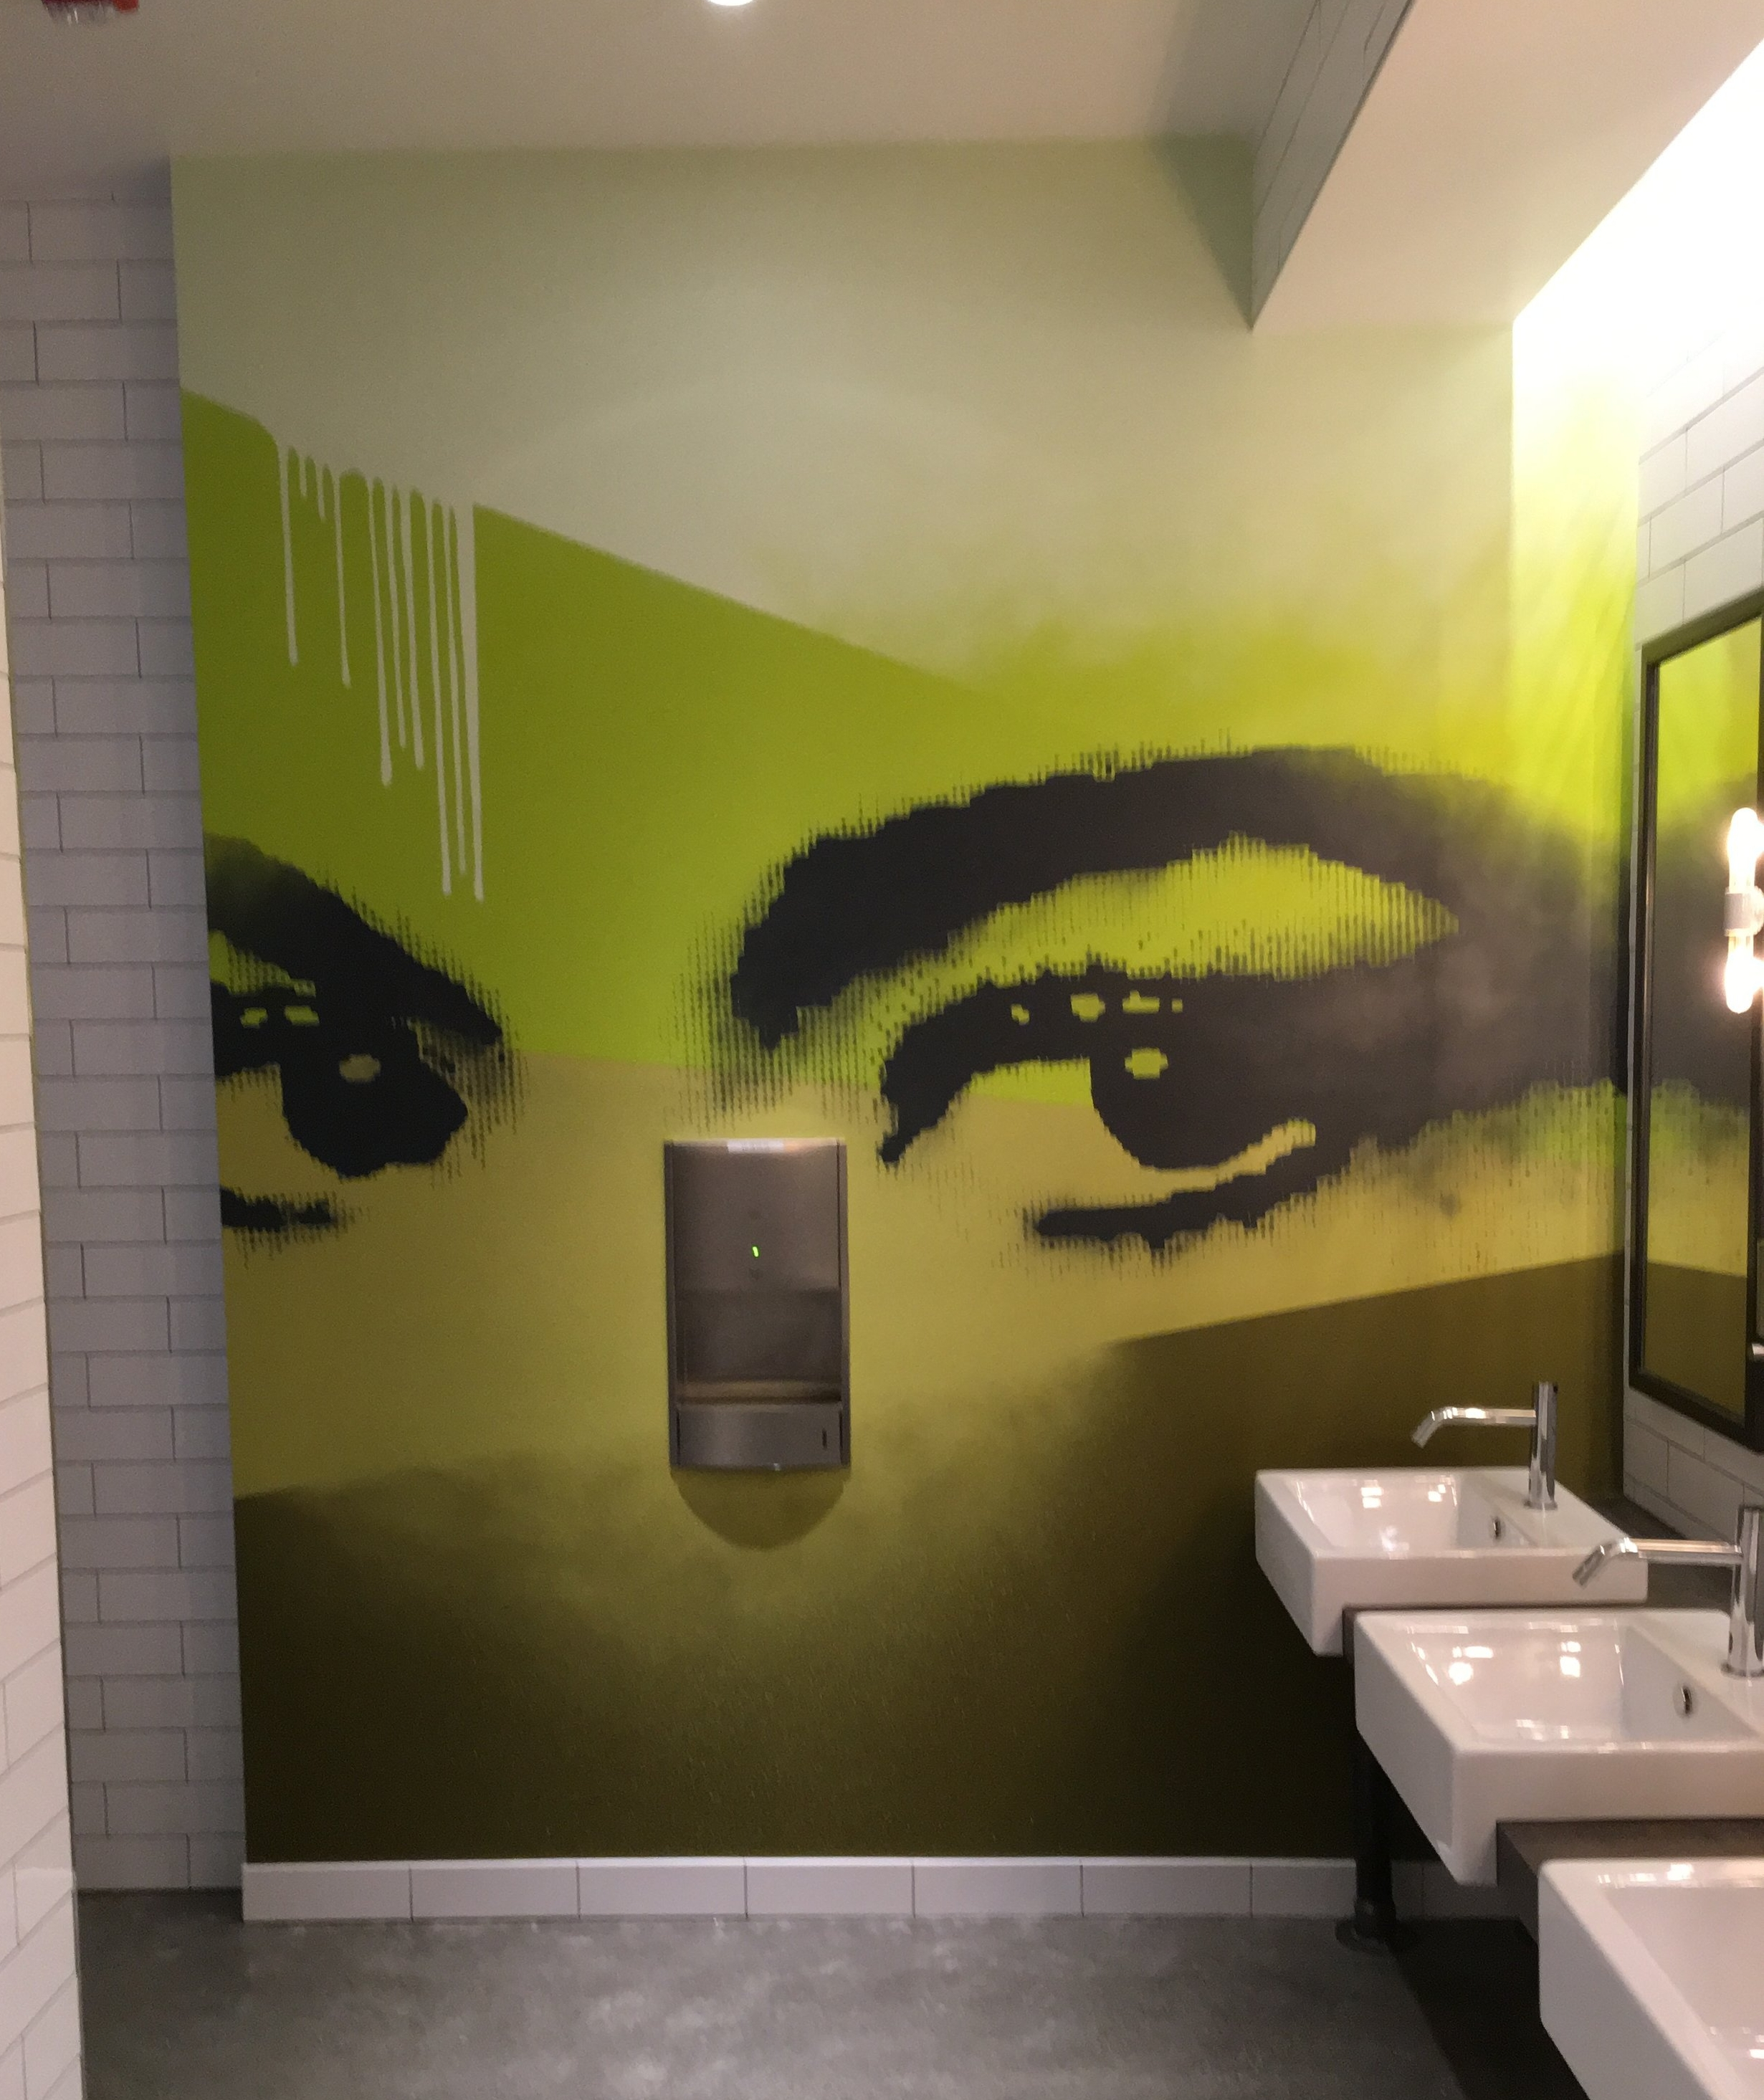 Strider Patton - Office mural - San Francisco, CA 2016